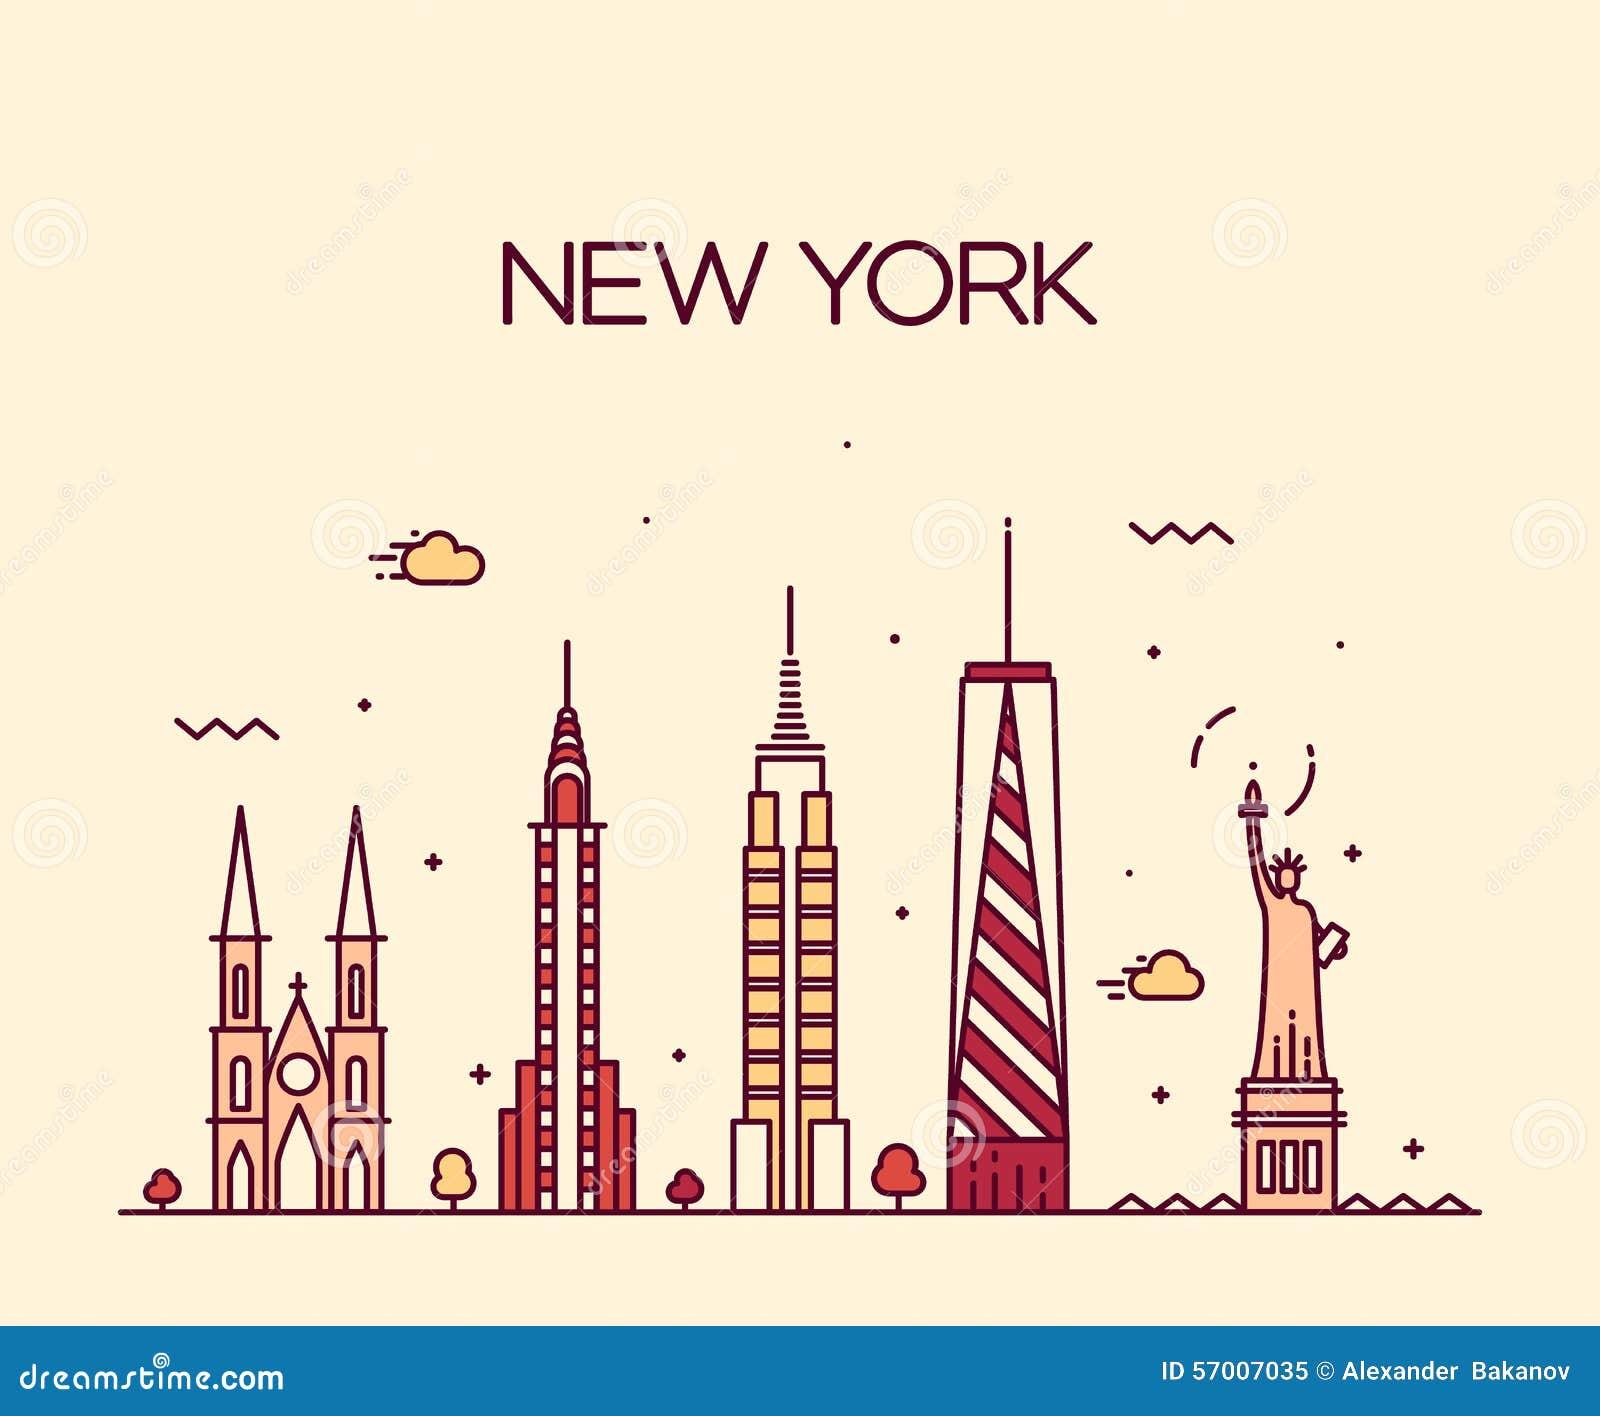 Line Art Illustration Style : New york city skyline silhouette line art style stock